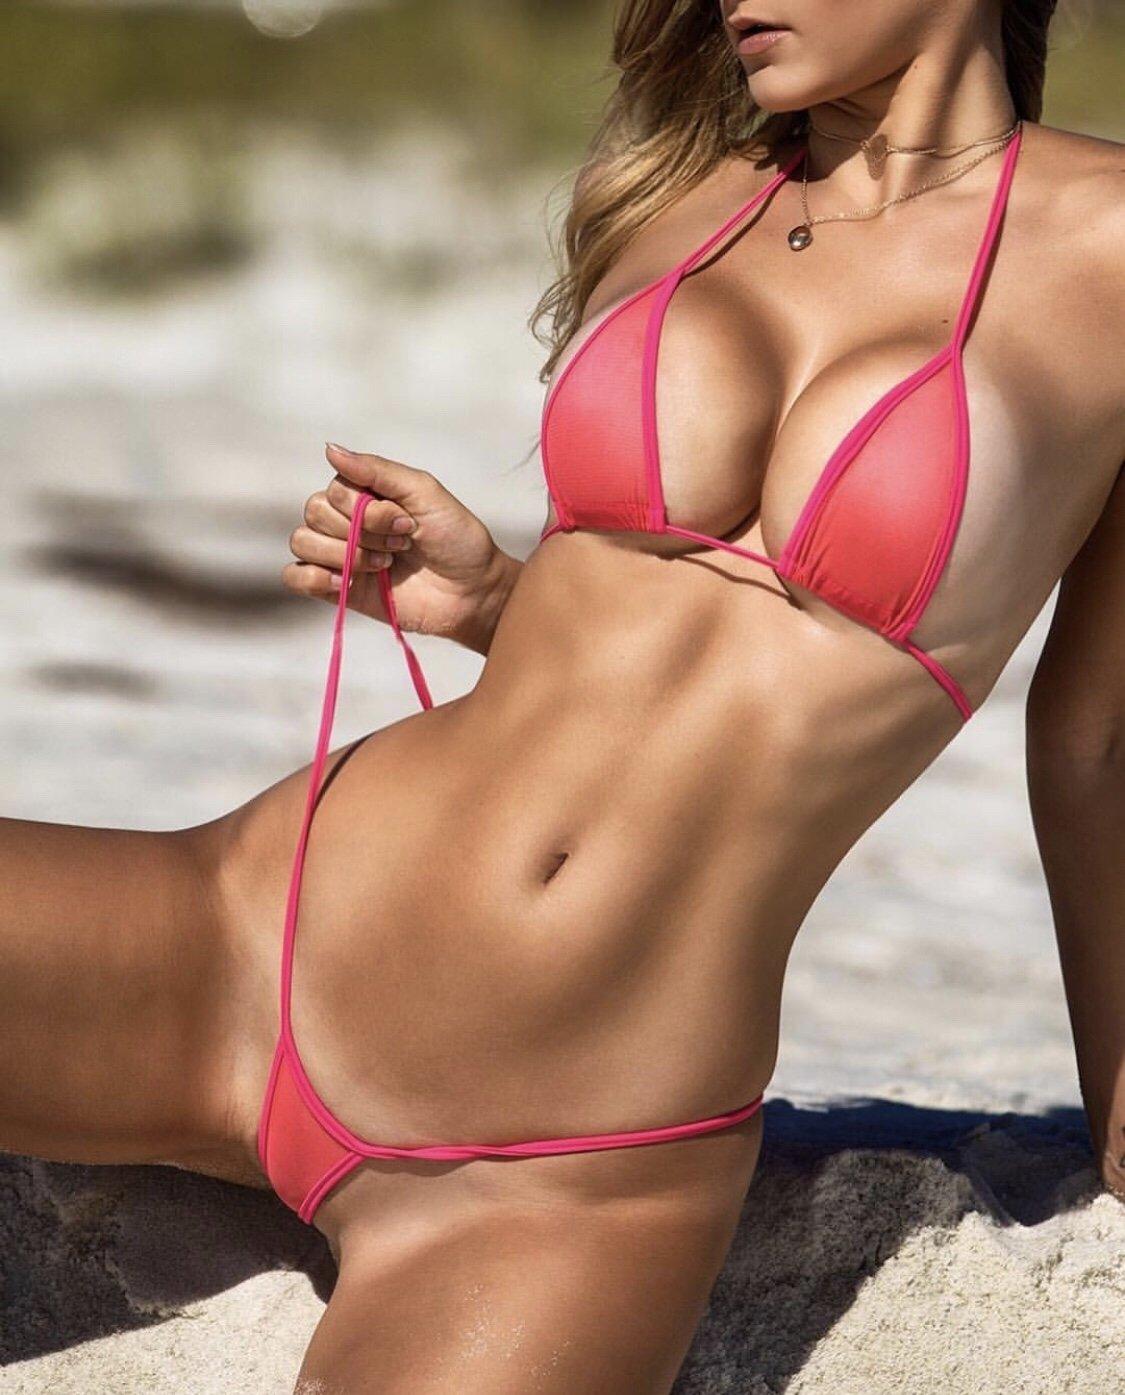 Bakini Pics